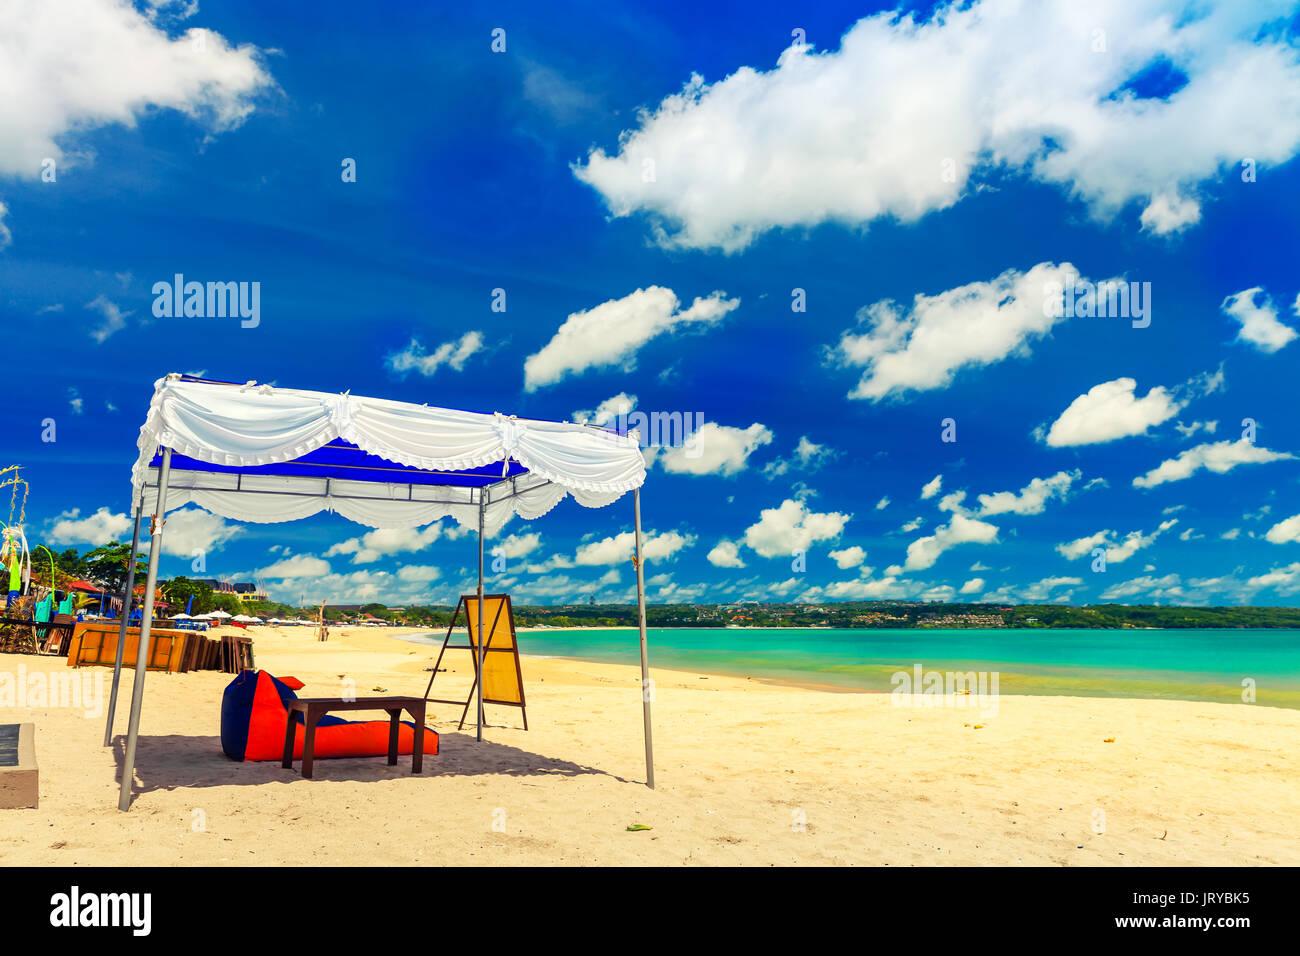 Bett Am Strand Fur Romantische Liebespaar Reisenden Touristen